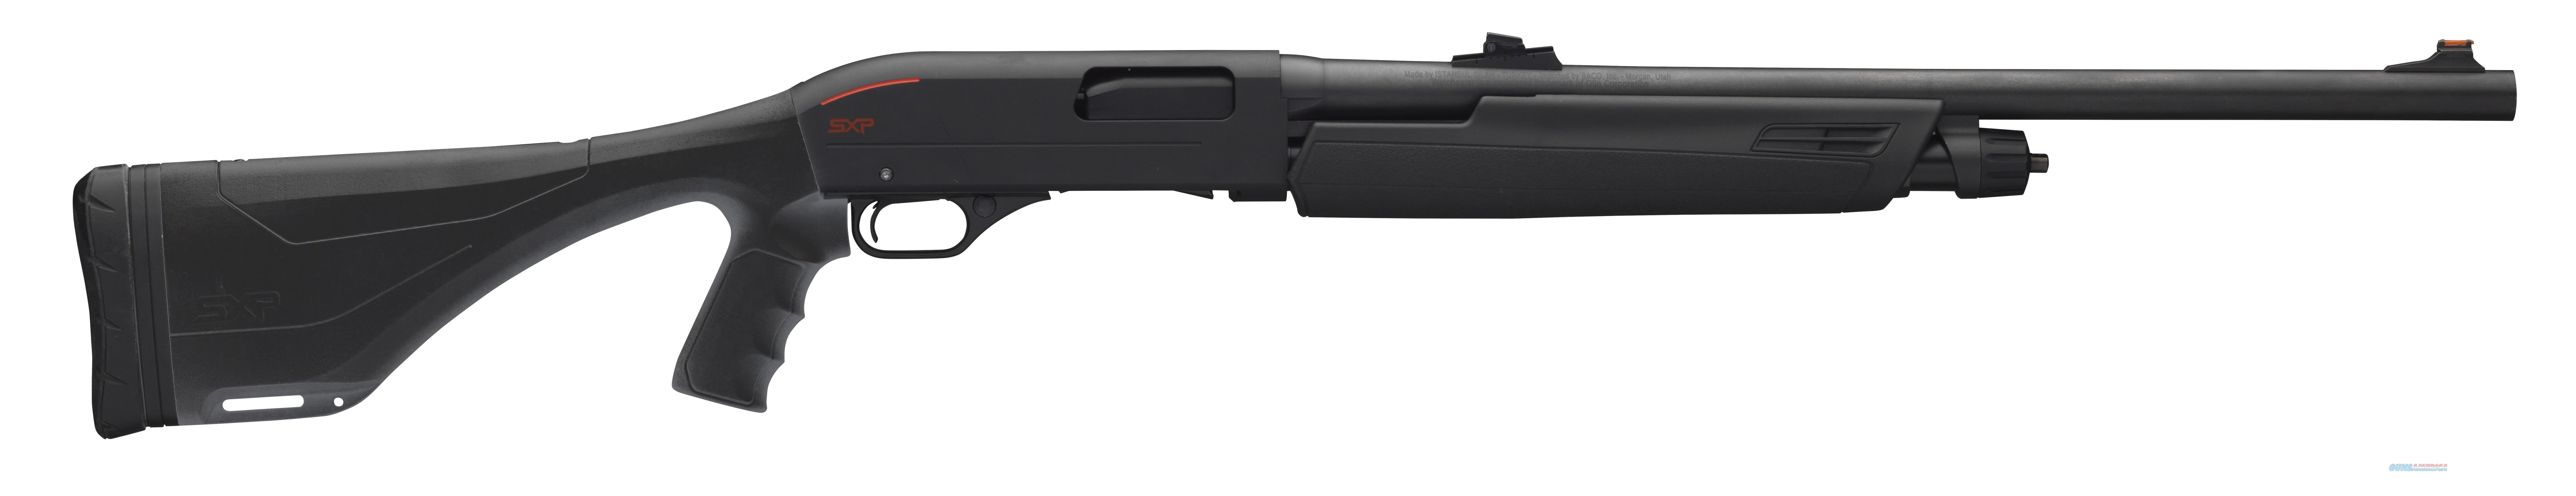 "Winchester Guns 512312340 Sxp Pump 12 Gauge 22"" 3"" Black Synthetic Stk Black Aluminum Alloy Rcvr 512312340  Guns > Shotguns > W Misc Shotguns"